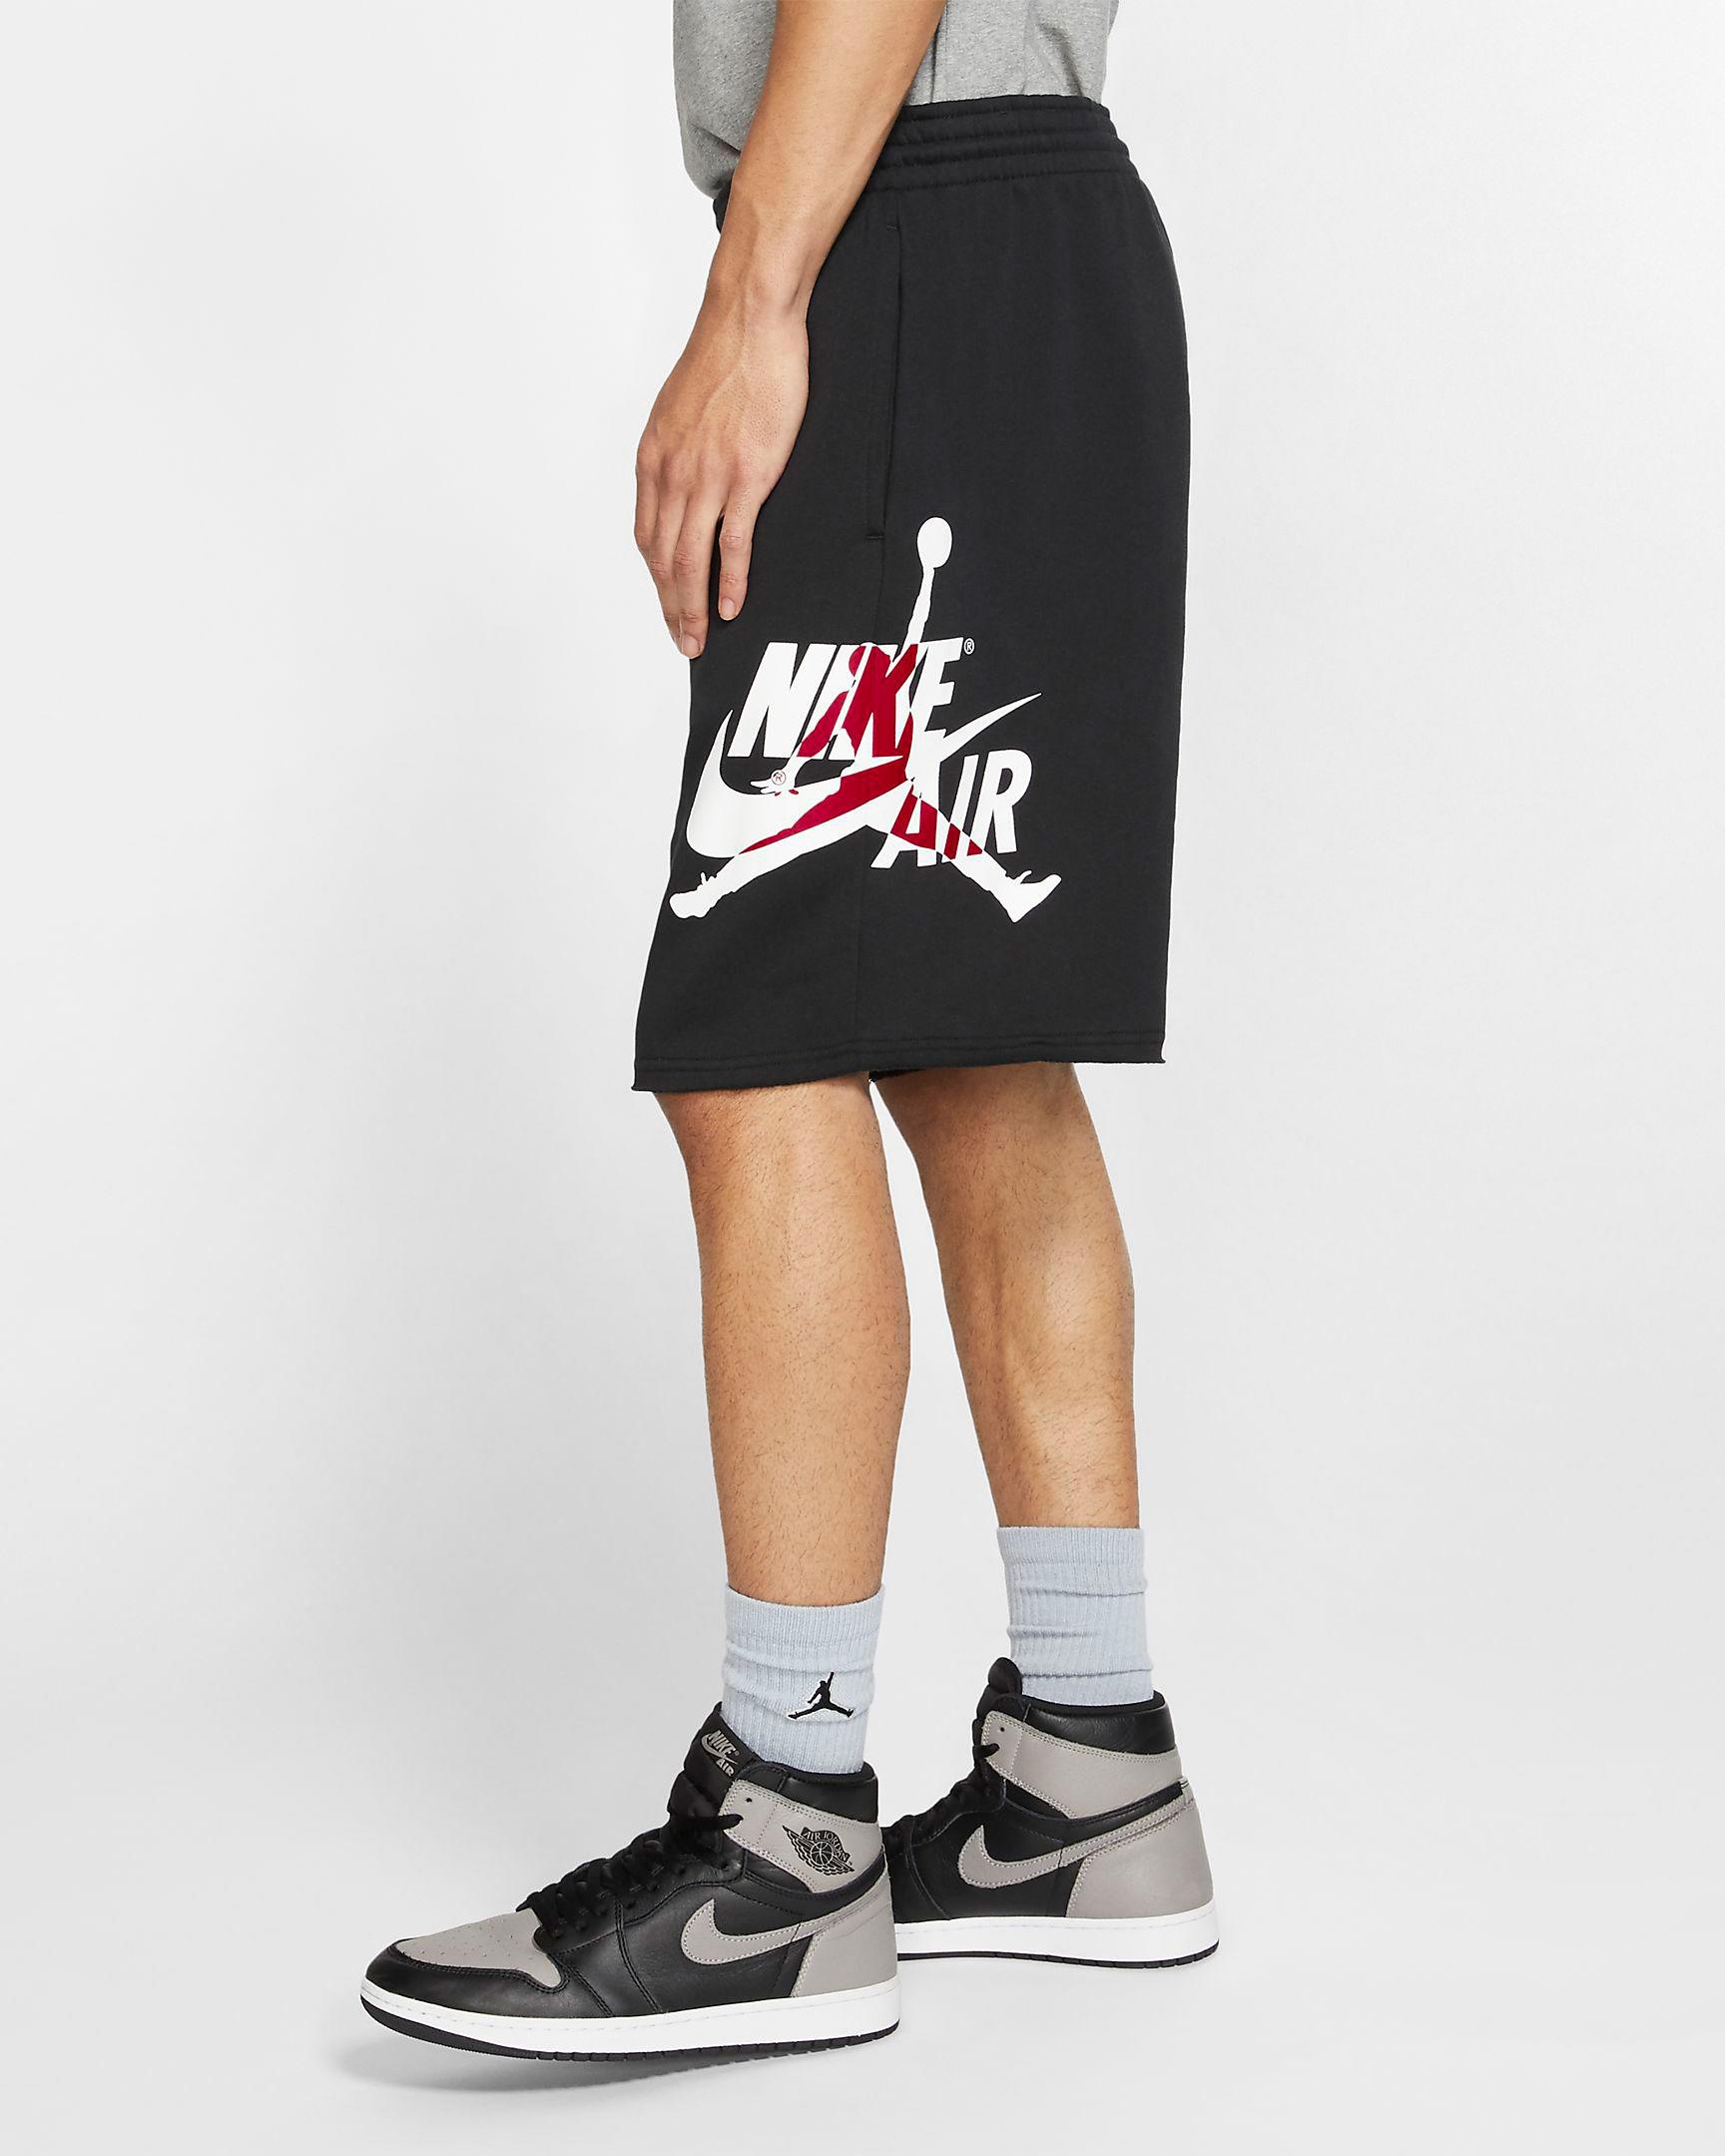 air-jordan-1-high-gym-red-black-shorts-1